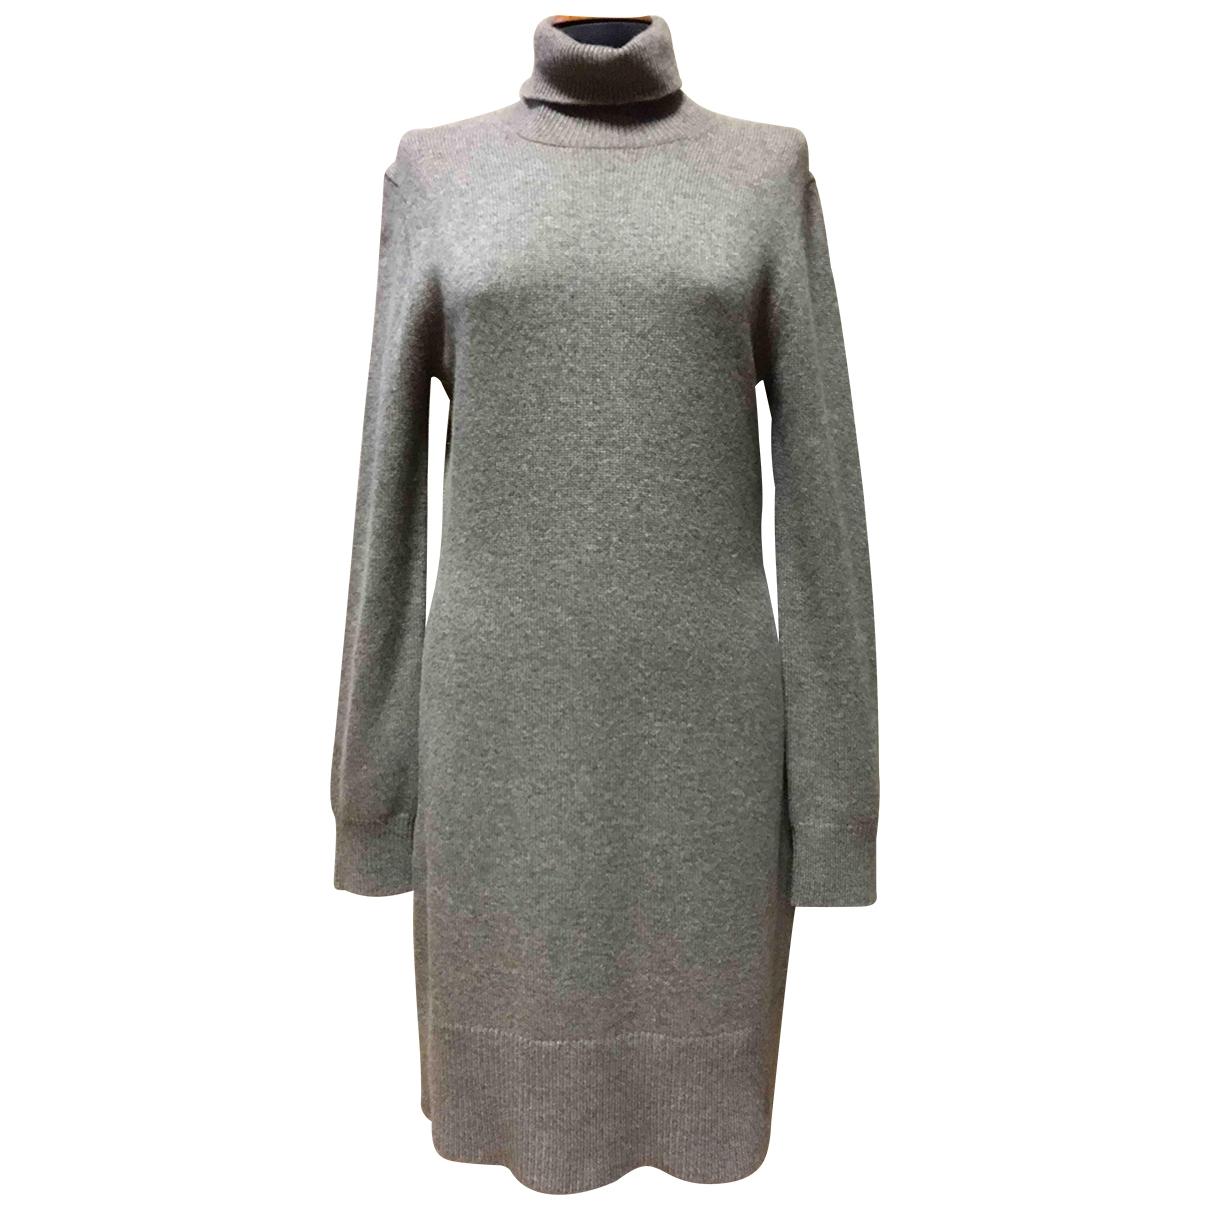 Michael Kors \N Grey Cashmere dress for Women L International